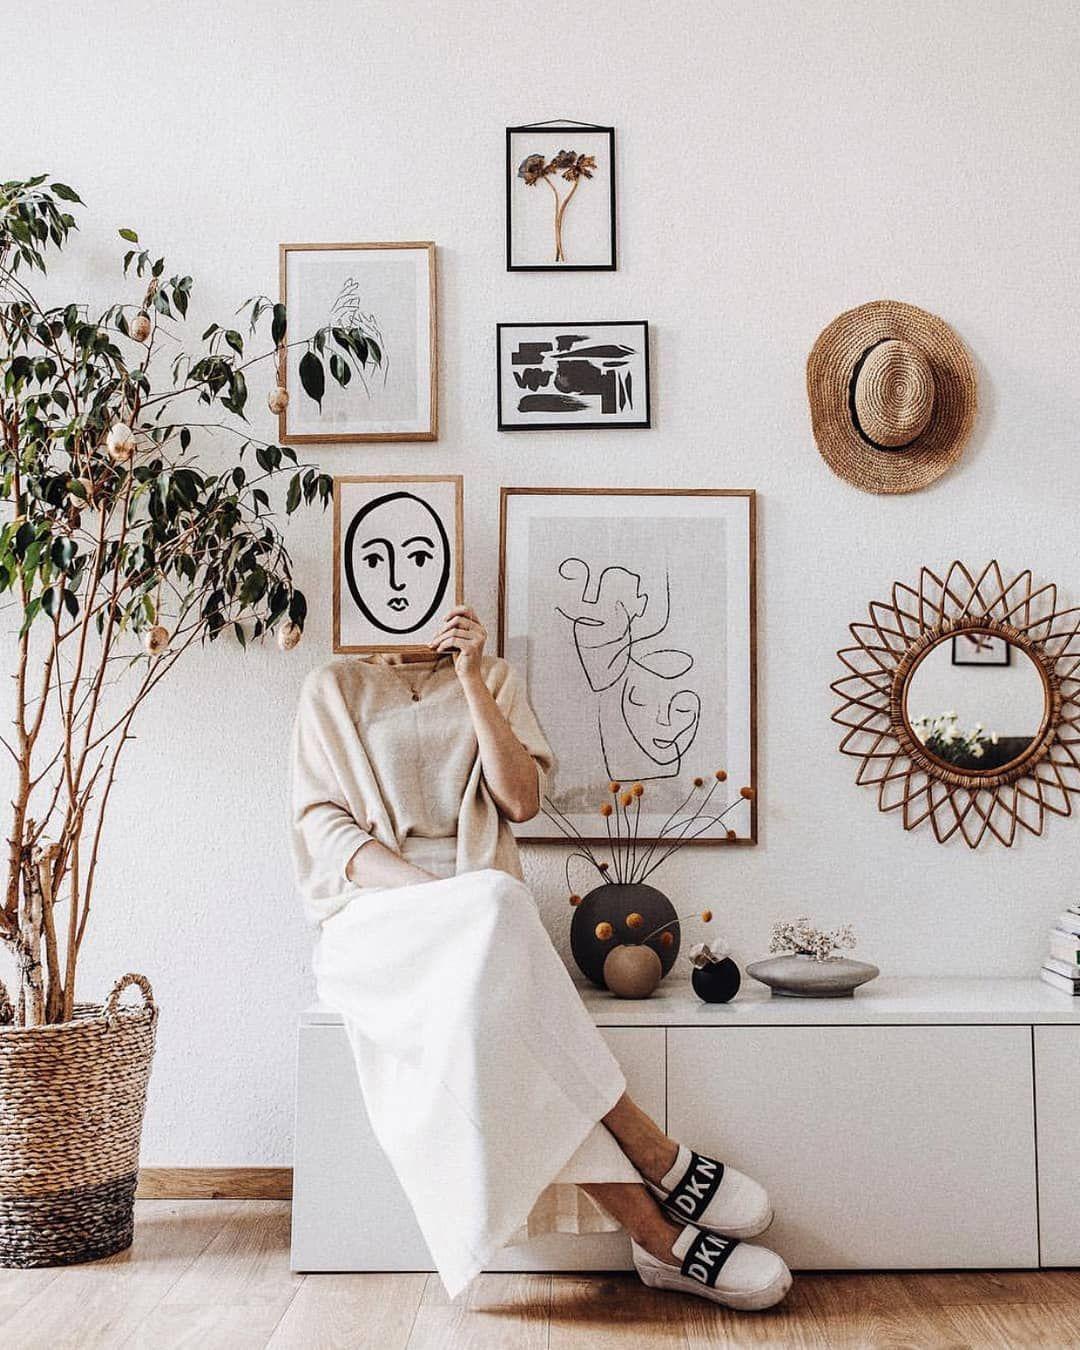 Gallery wall magic!